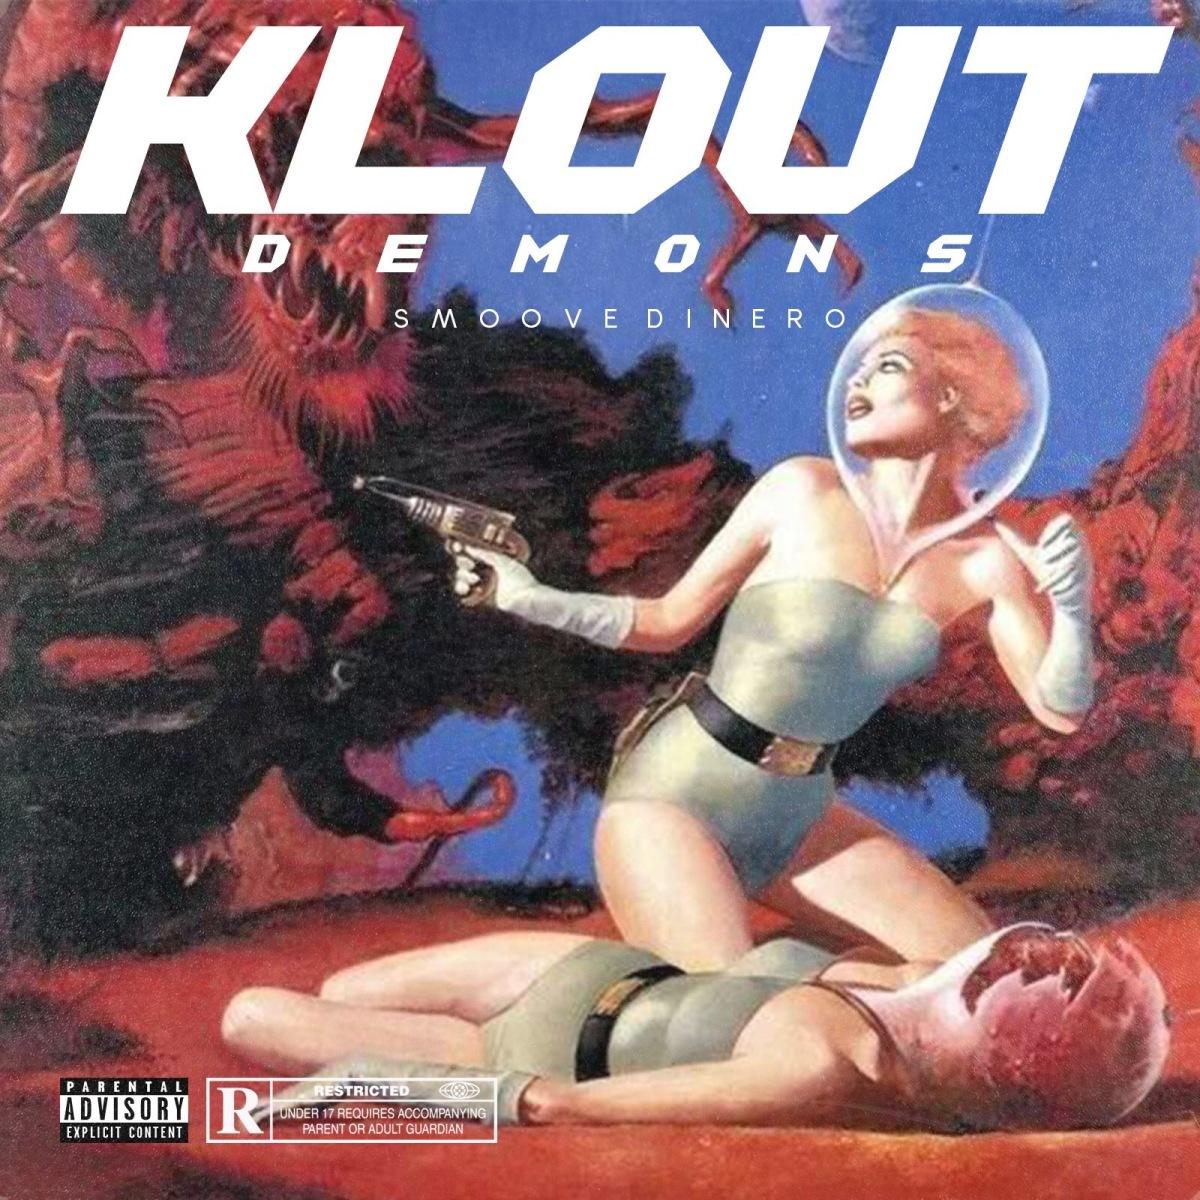 DJ TOPGUN: Smooth Dinero - Klout Demons